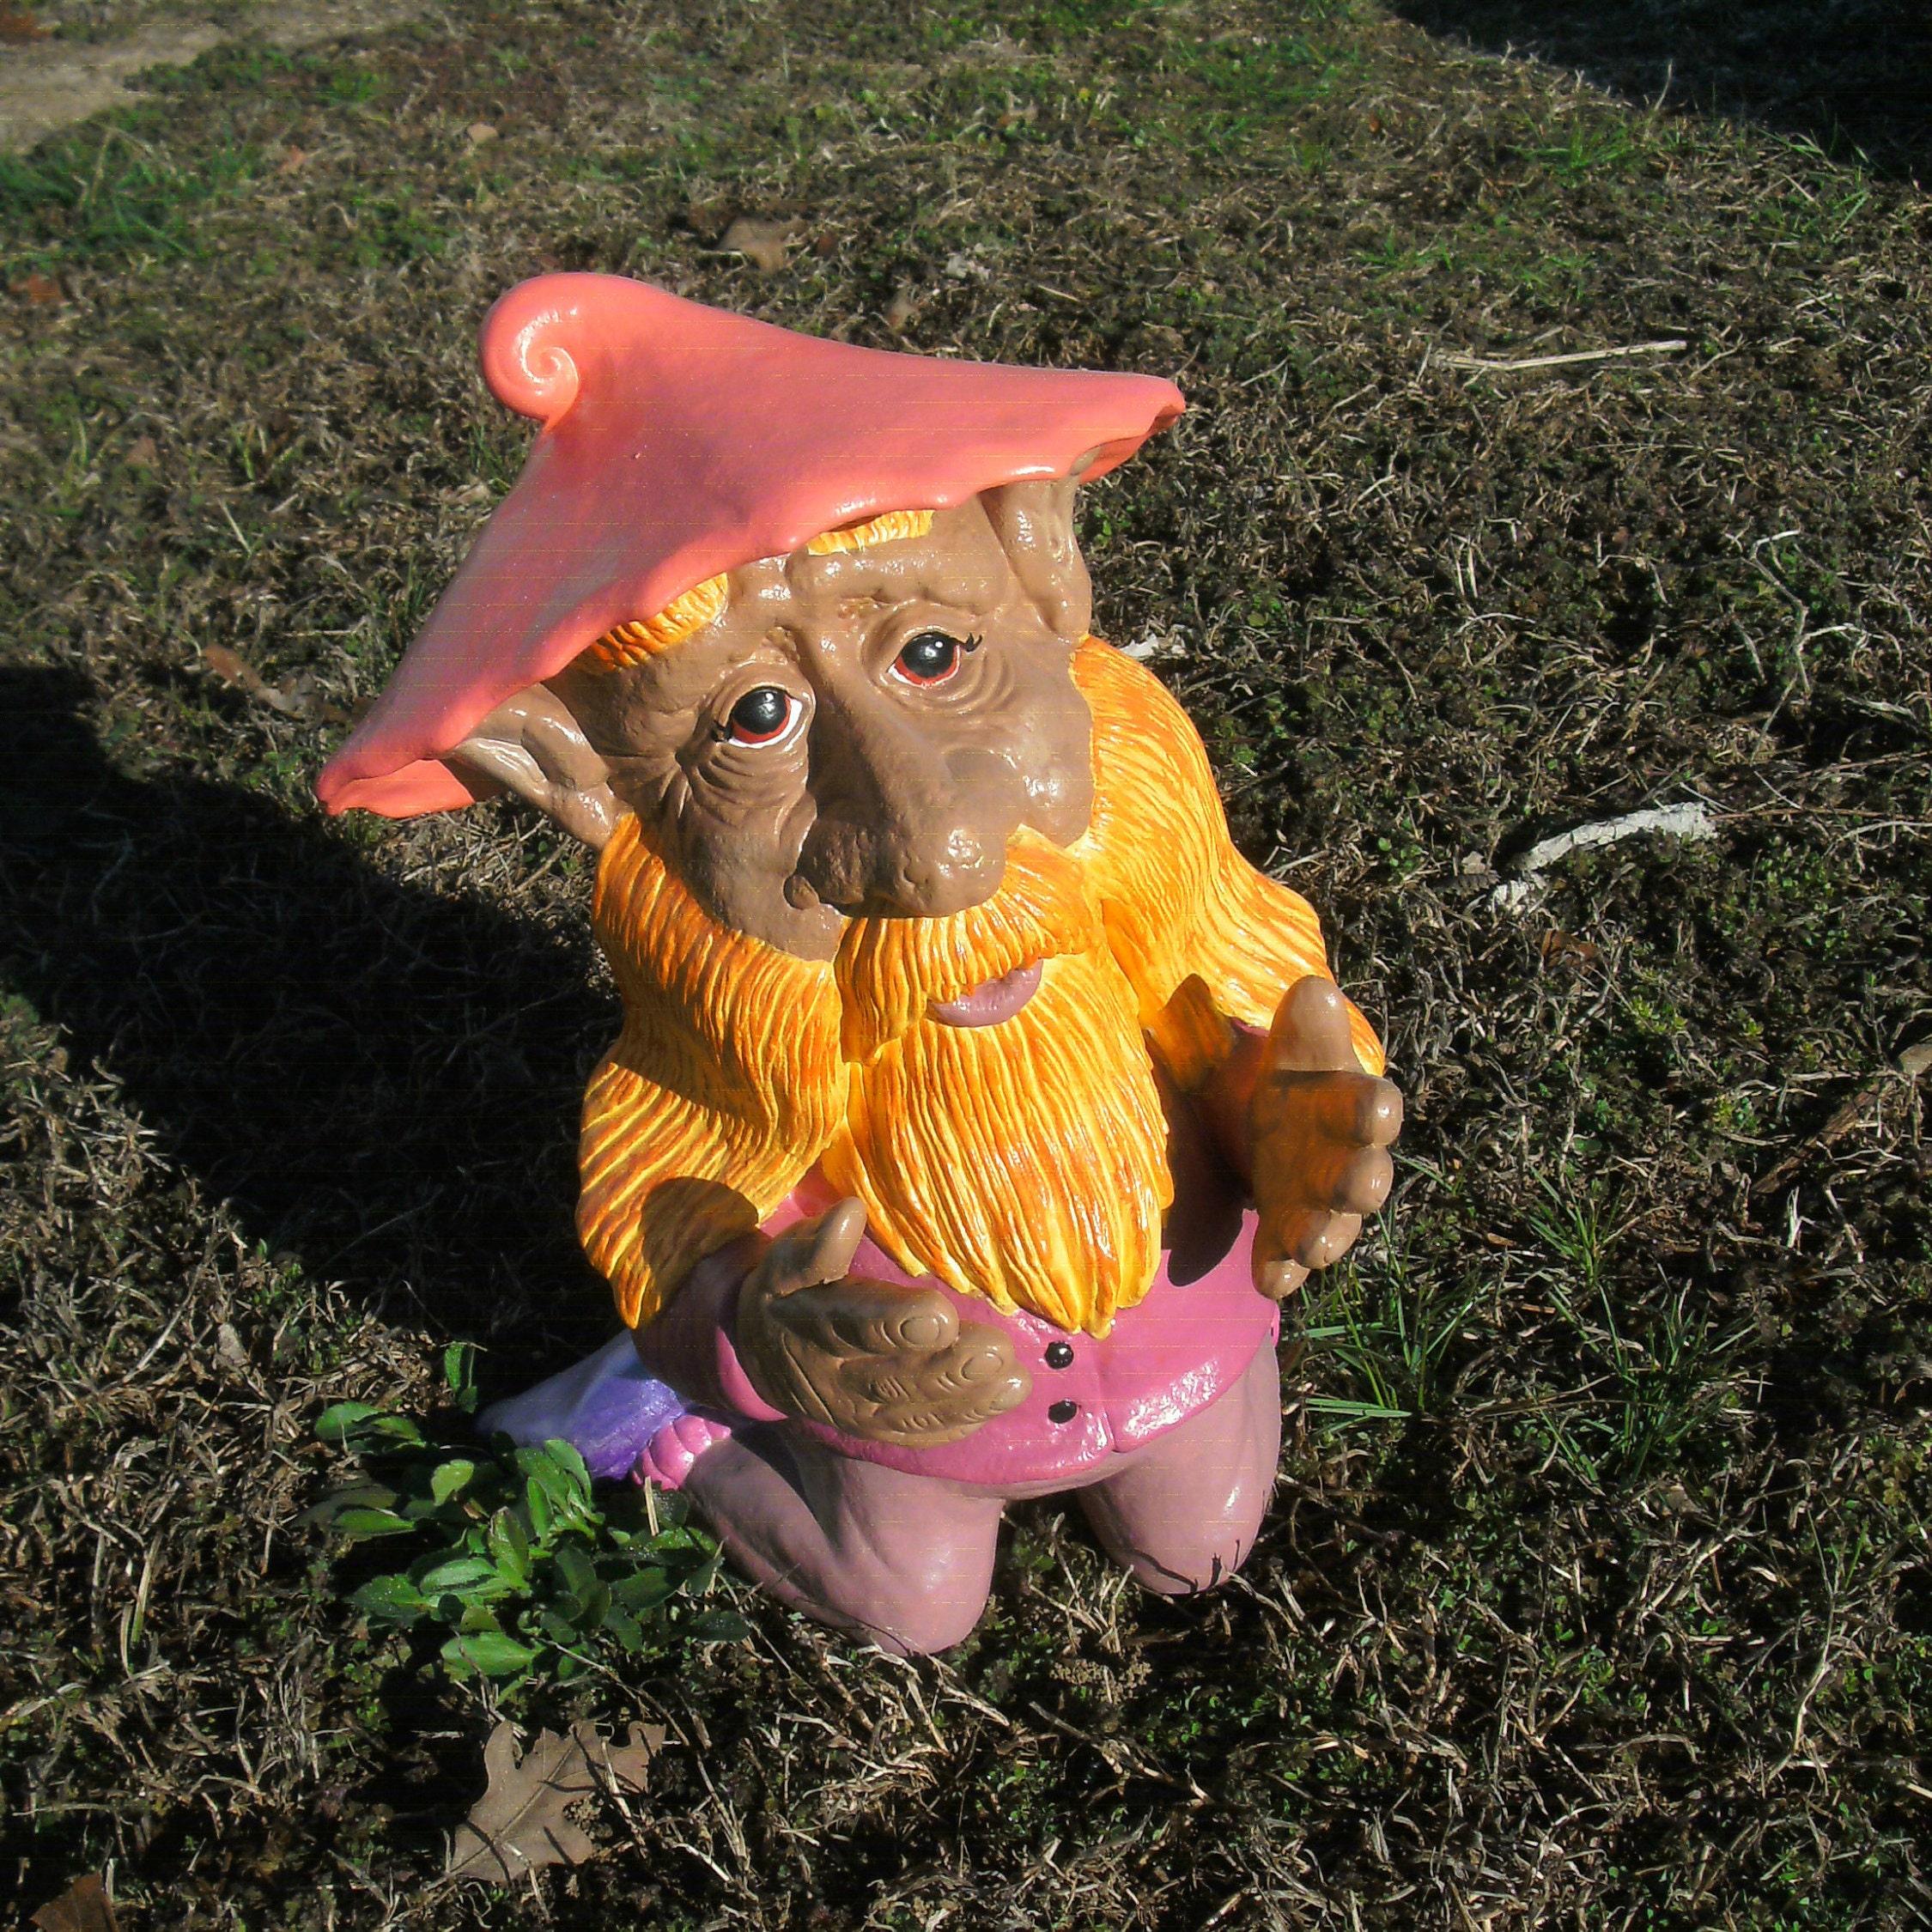 Outdoor ready ceramic garden gnome Praying Outdoor garden gnome digging planting Kneeling ts for her ceramic gnome troll decor cute